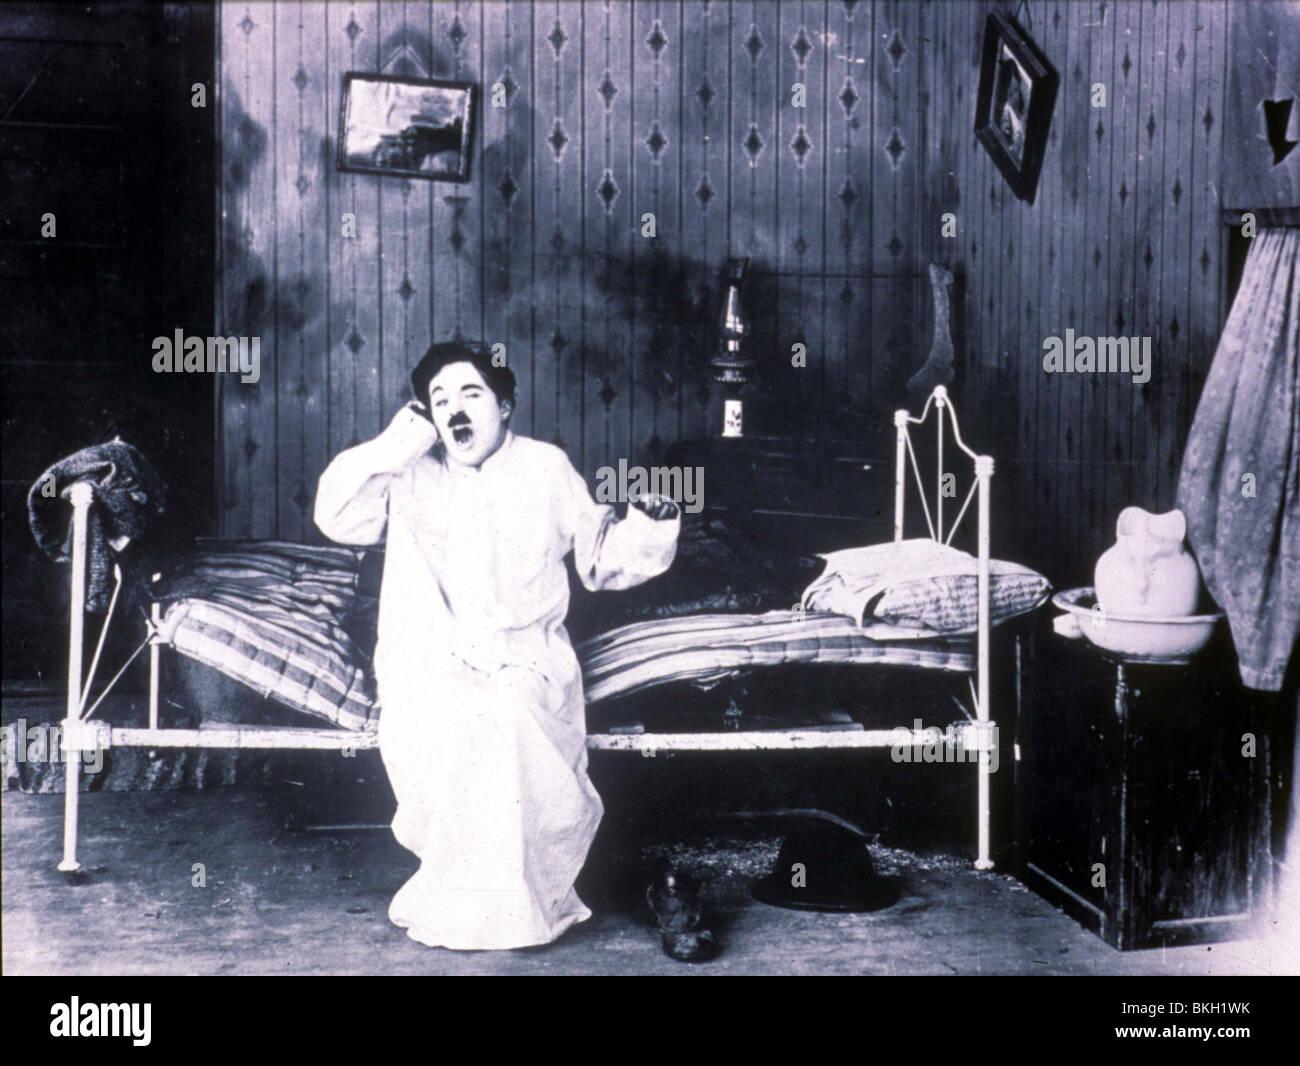 SUNNYSIDE (1919) CHARLIE CHAPLIN SNNY 001 - Stock Image